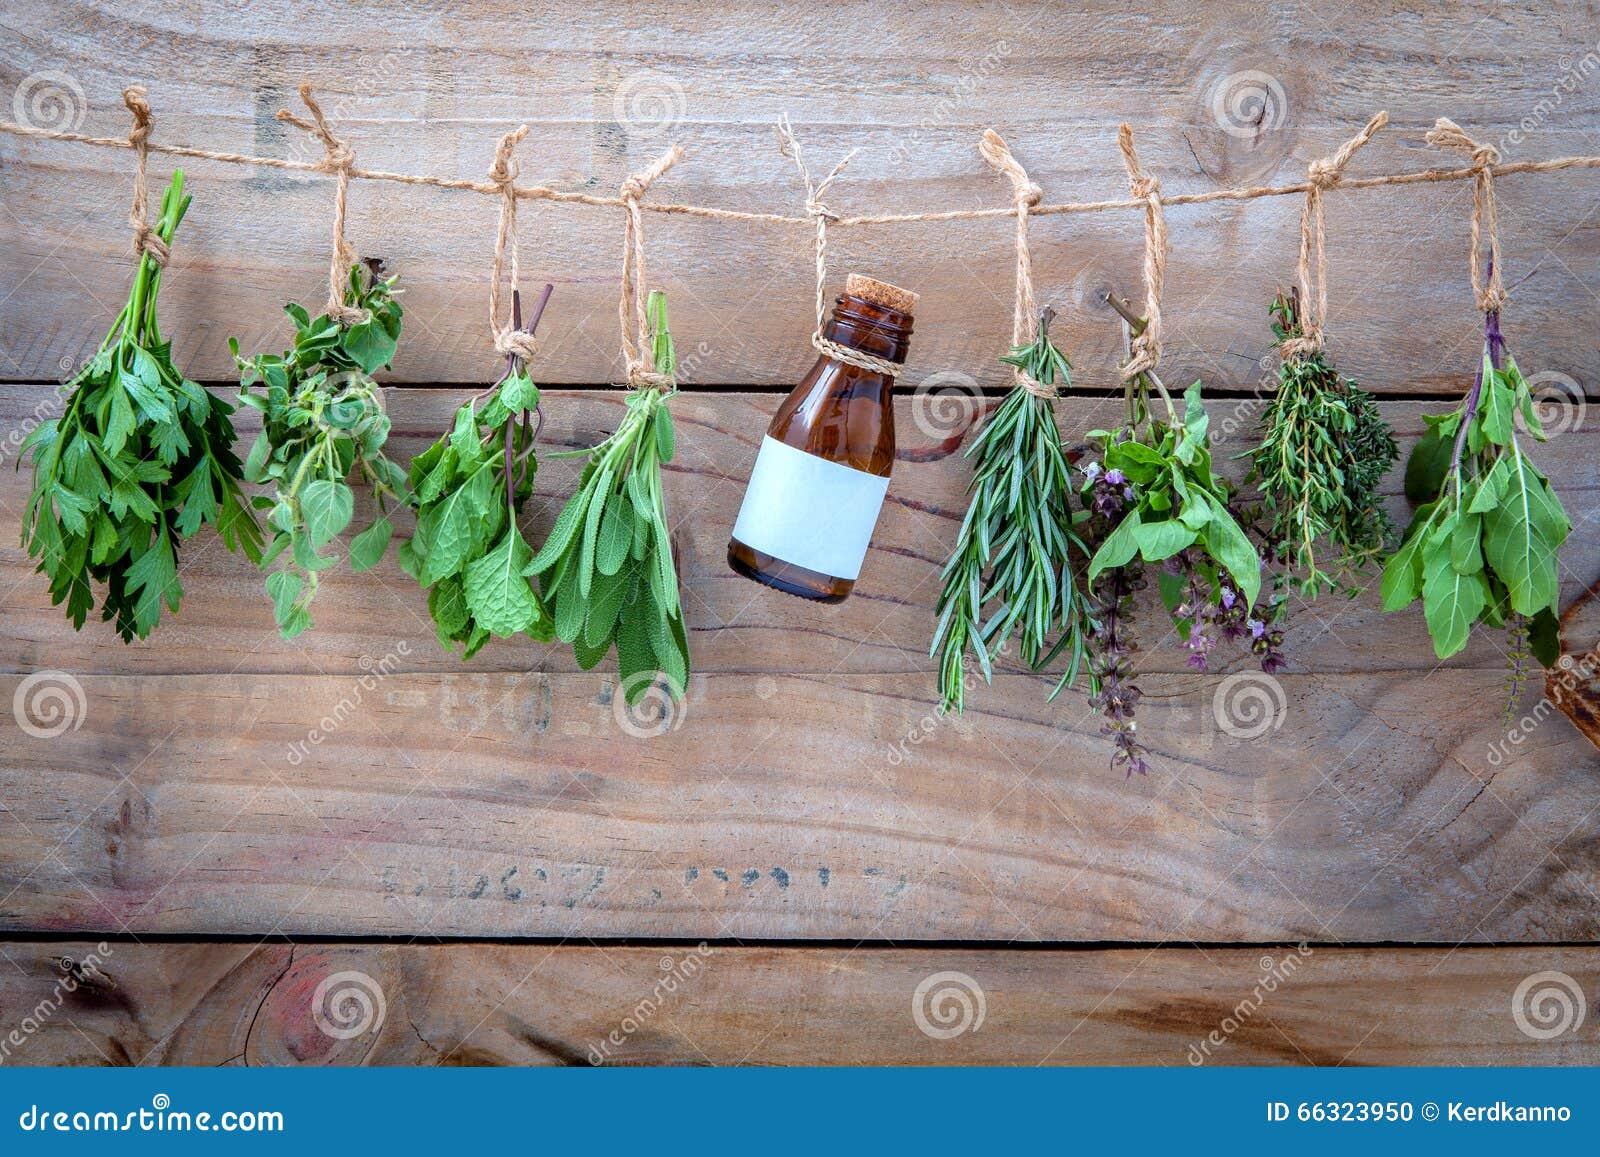 Assorted hängende Kräuter, Petersilie, Oregano, Minze, Salbei, Rosmarin, swee